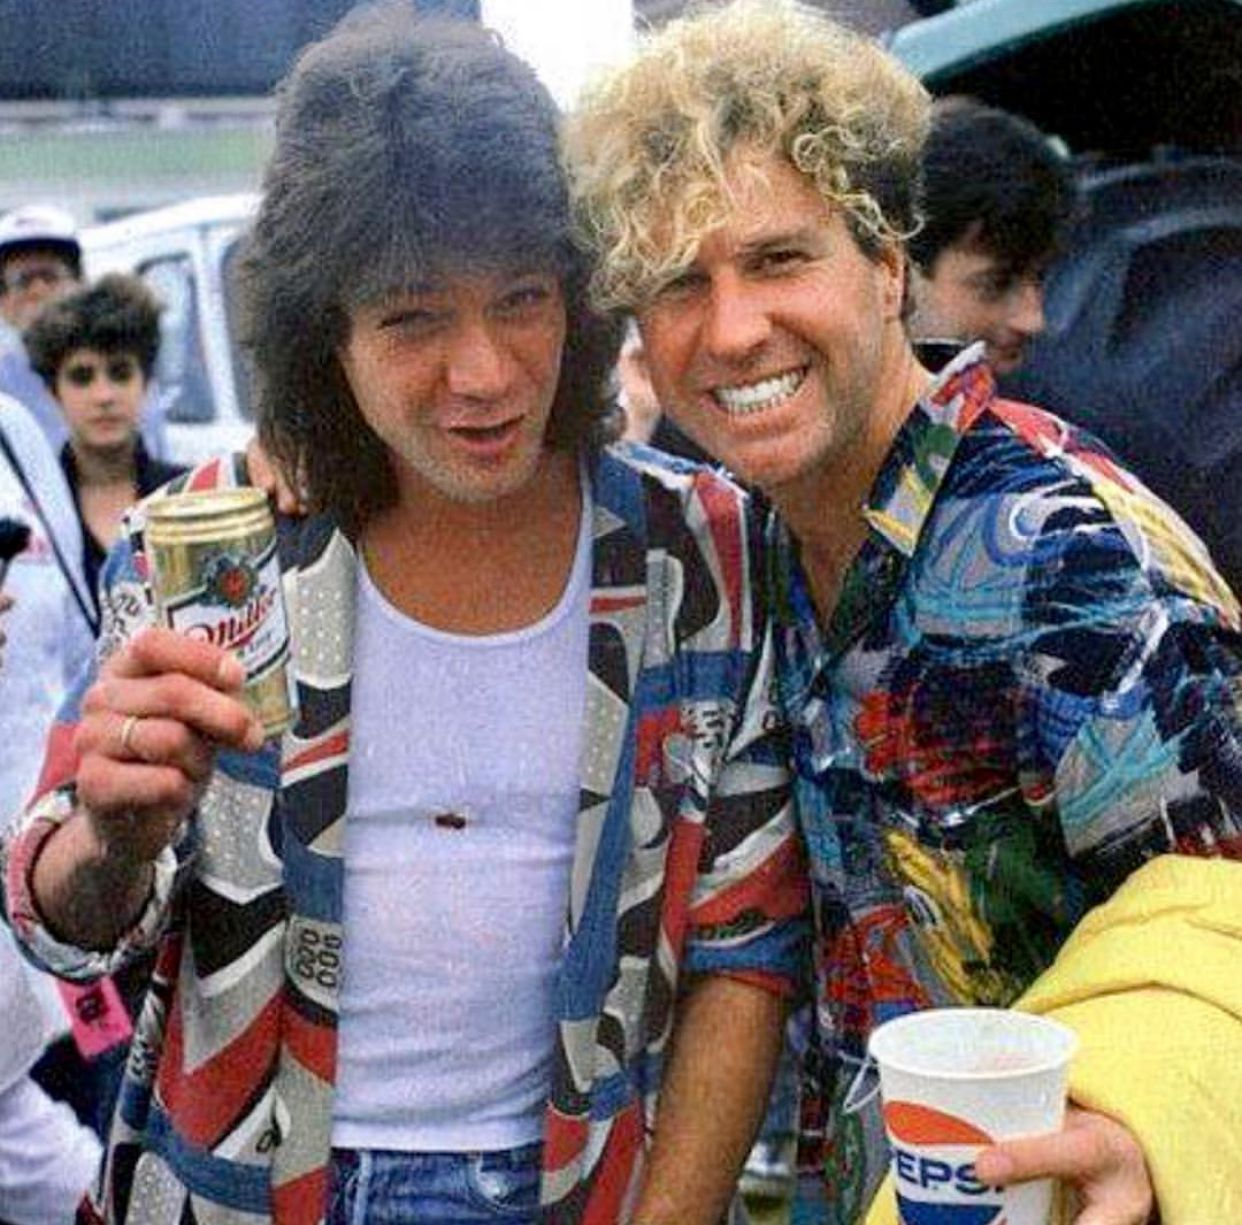 Pin By Keith Newton On Van Halen Life Van Halen Van Halen 5150 Eddie Van Halen